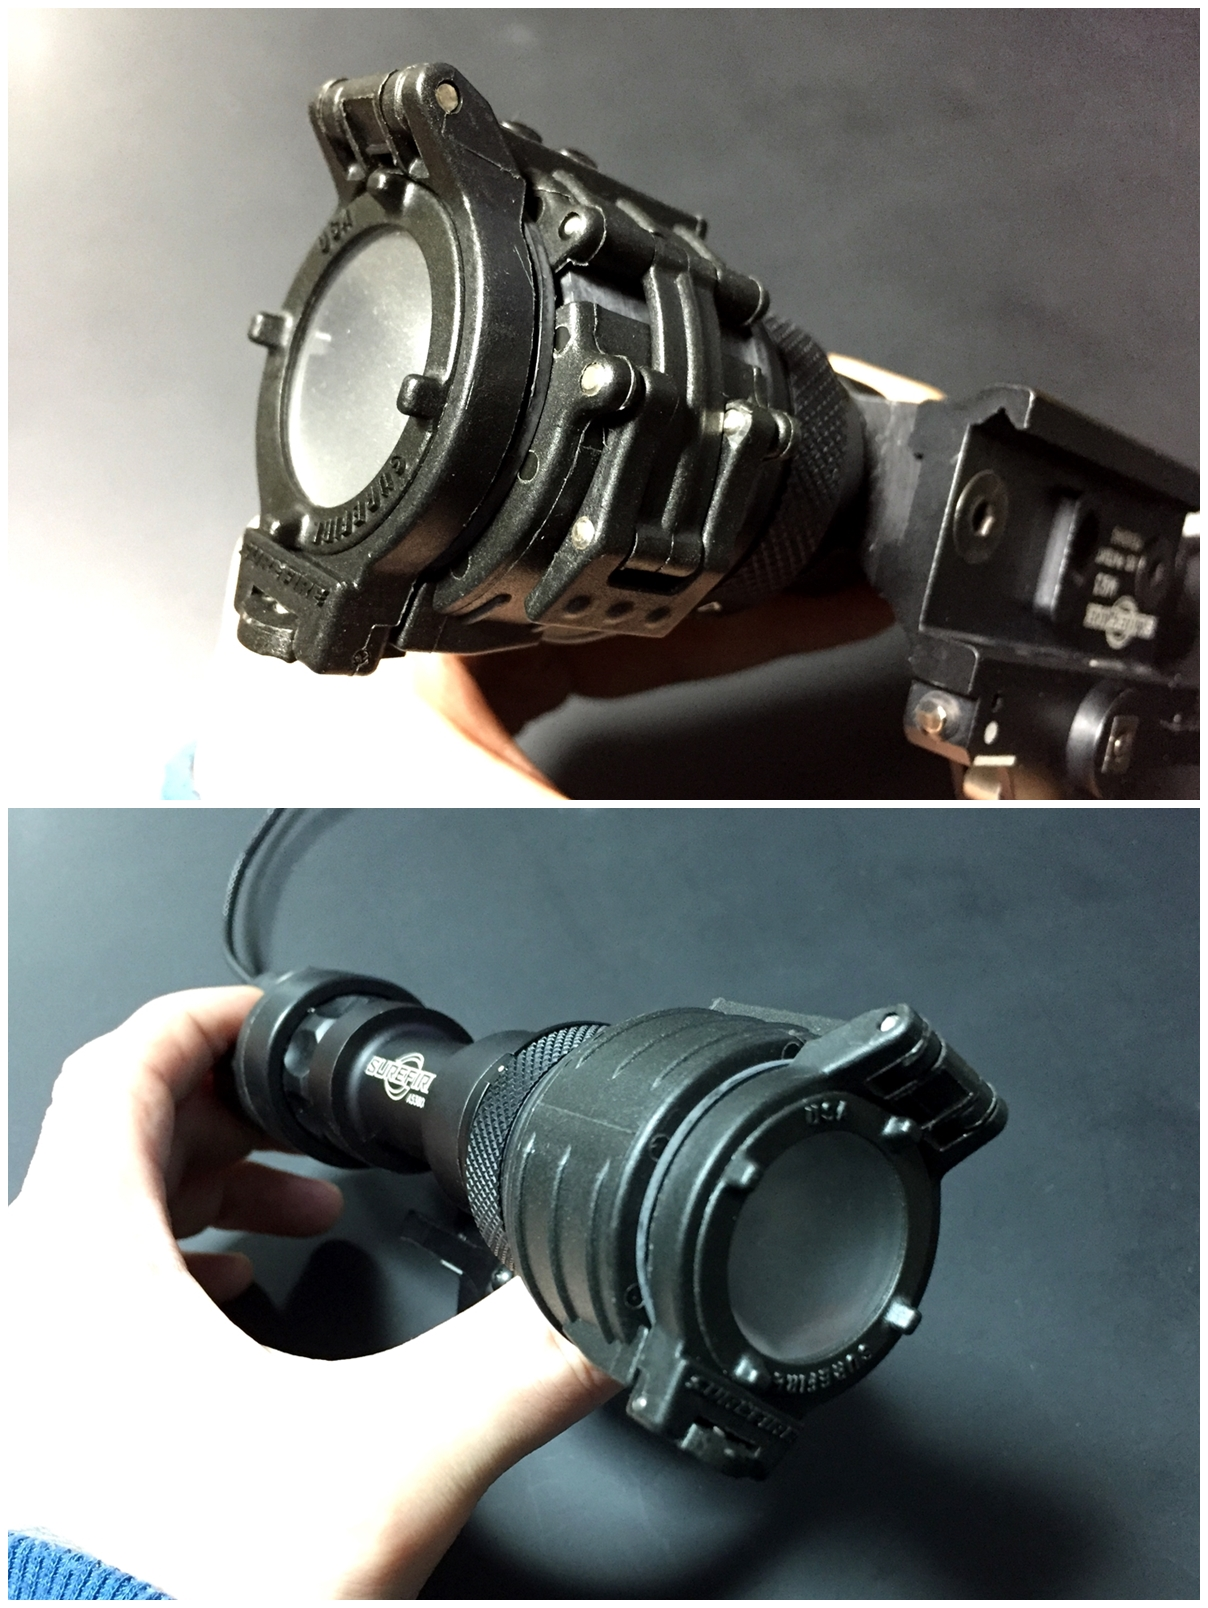 10 SUREFIRE FM44 FM4X 1.37 BEZEL VAMPIRE BEAM SHAPER M952V M900V IR シュアファイアー ビームシェーパー ウェポンライト カバー 検証 レビュー